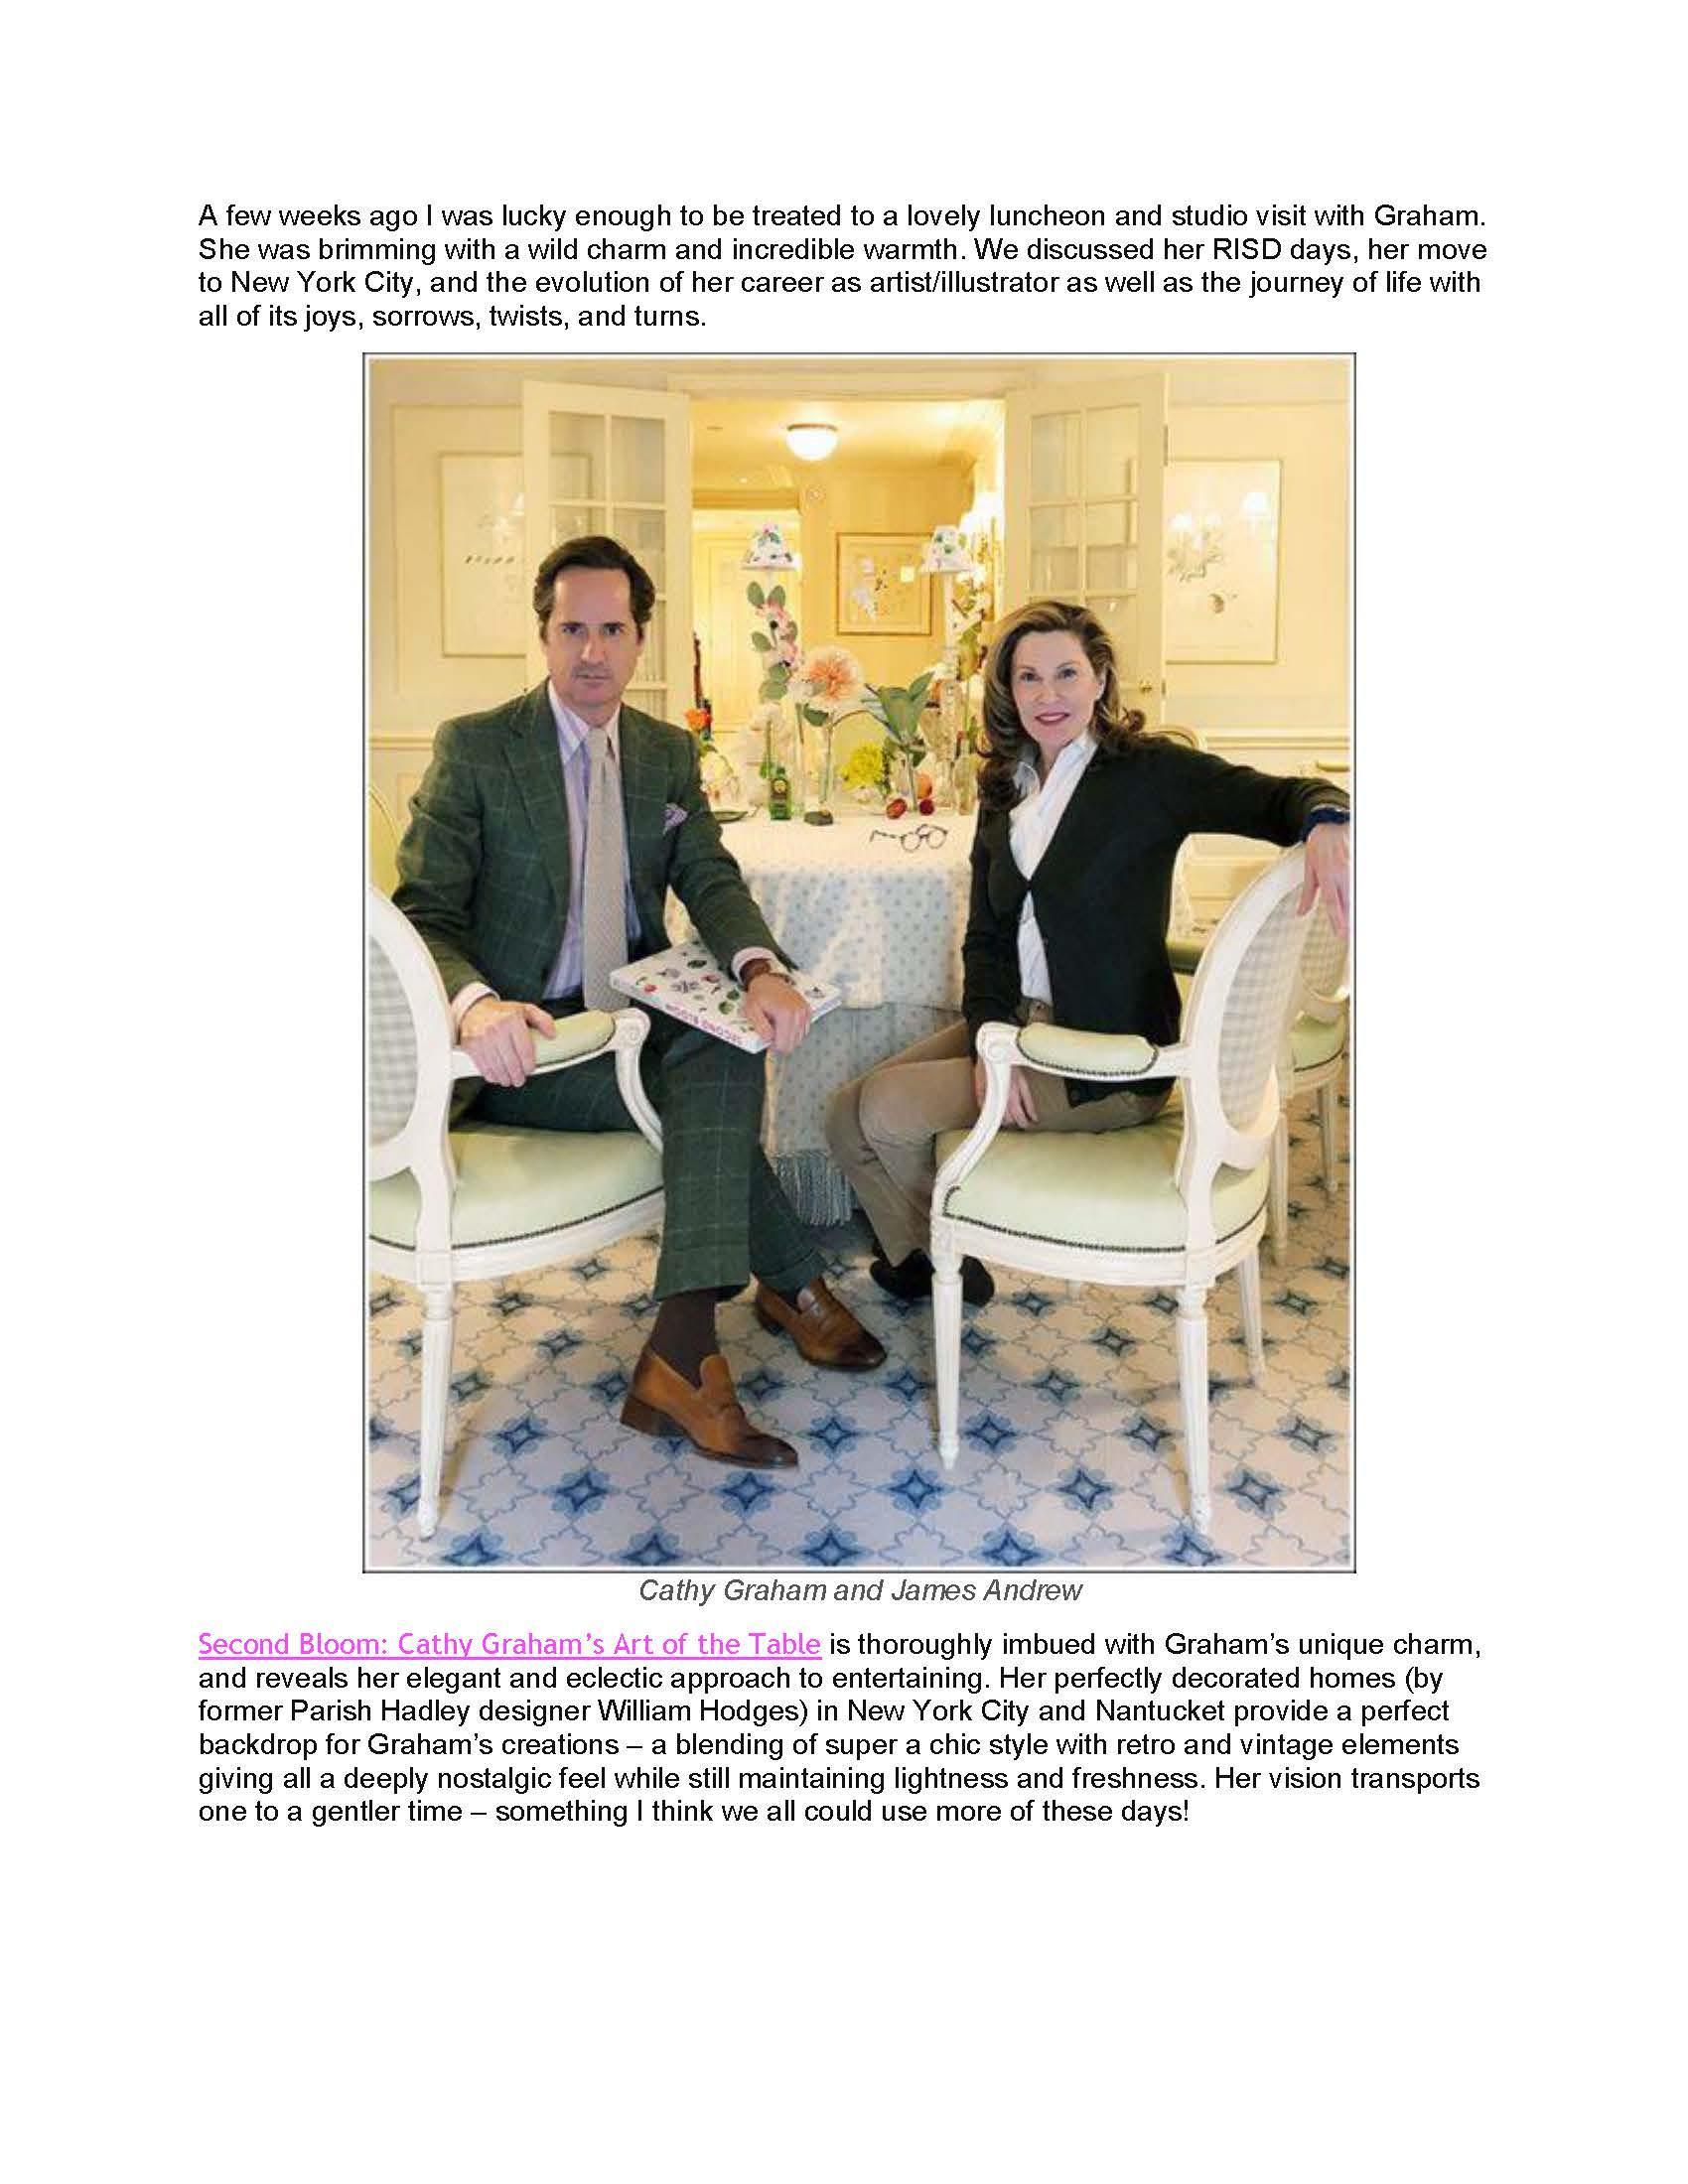 Cathy Graham Media Coverage 2017-2018_Page_54_Image_0001.jpg